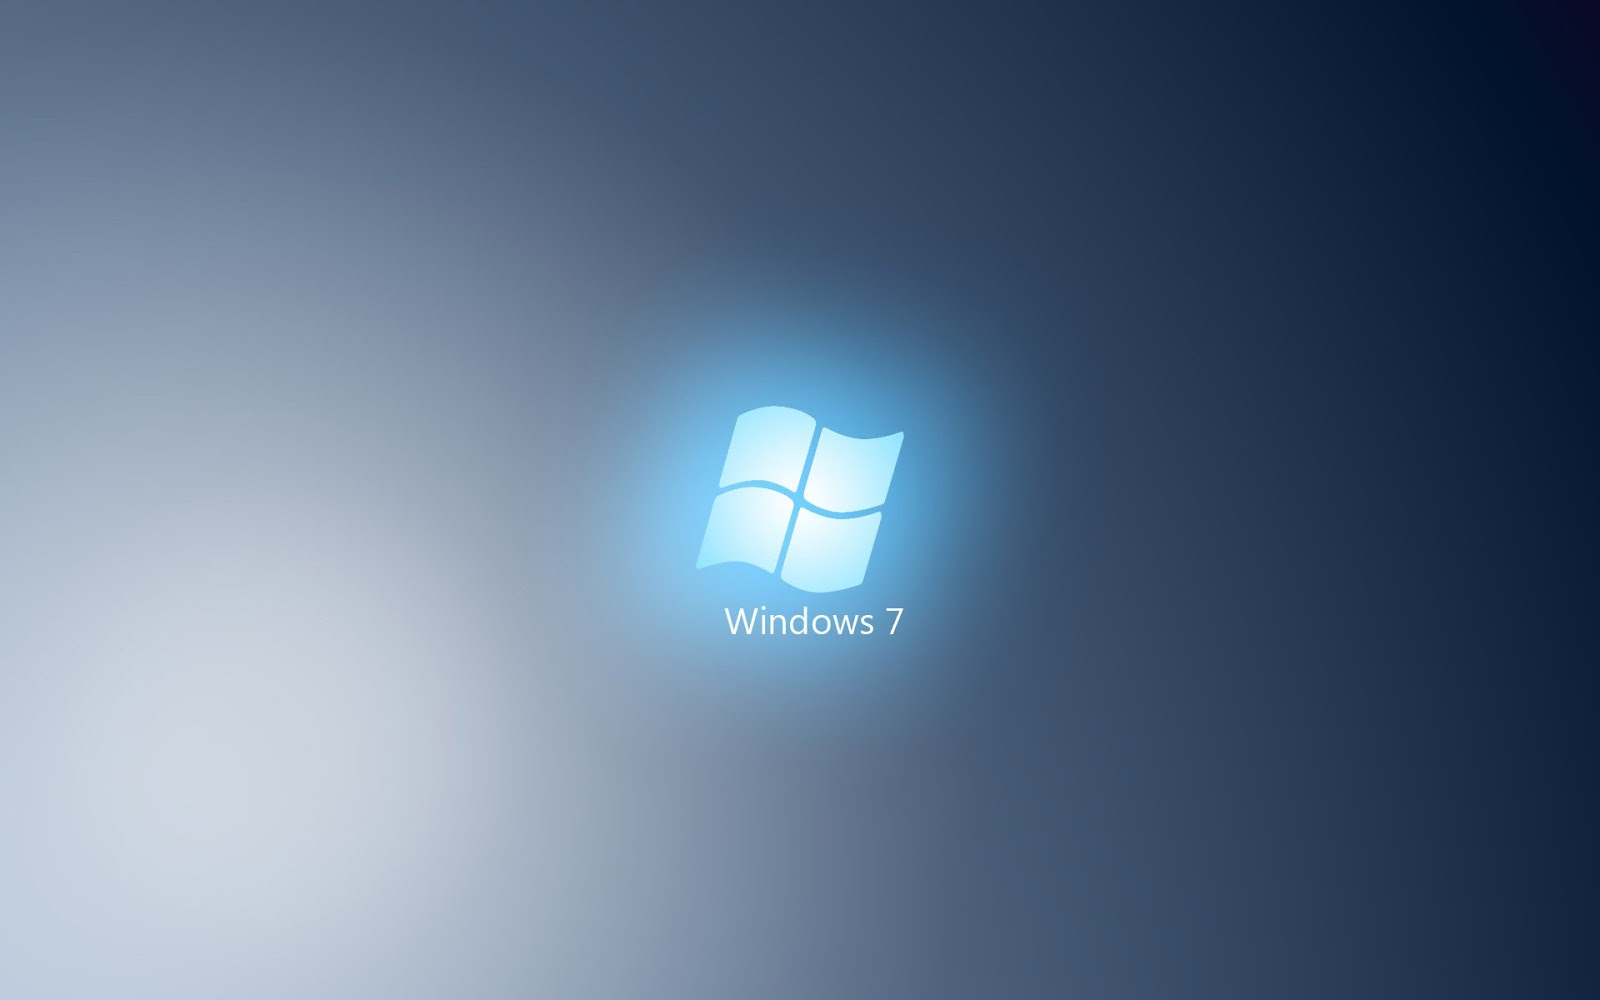 how to change desktop background windows 7 remotely